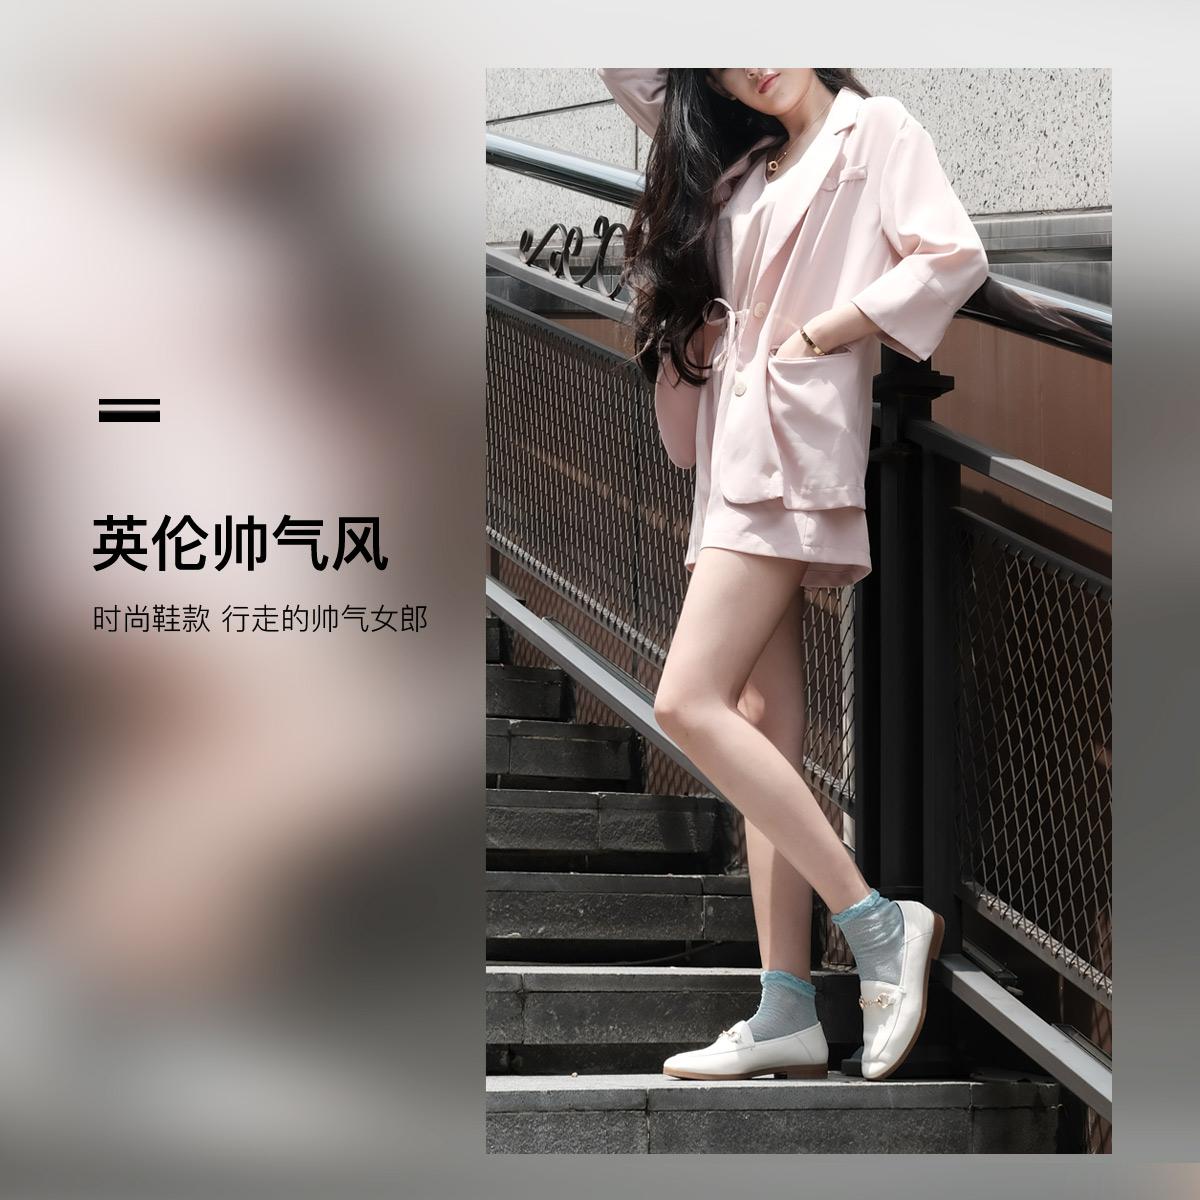 SS03112317 秋季新款一脚蹬乐福鞋平底舒适通勤女鞋单鞋 2020 星期六